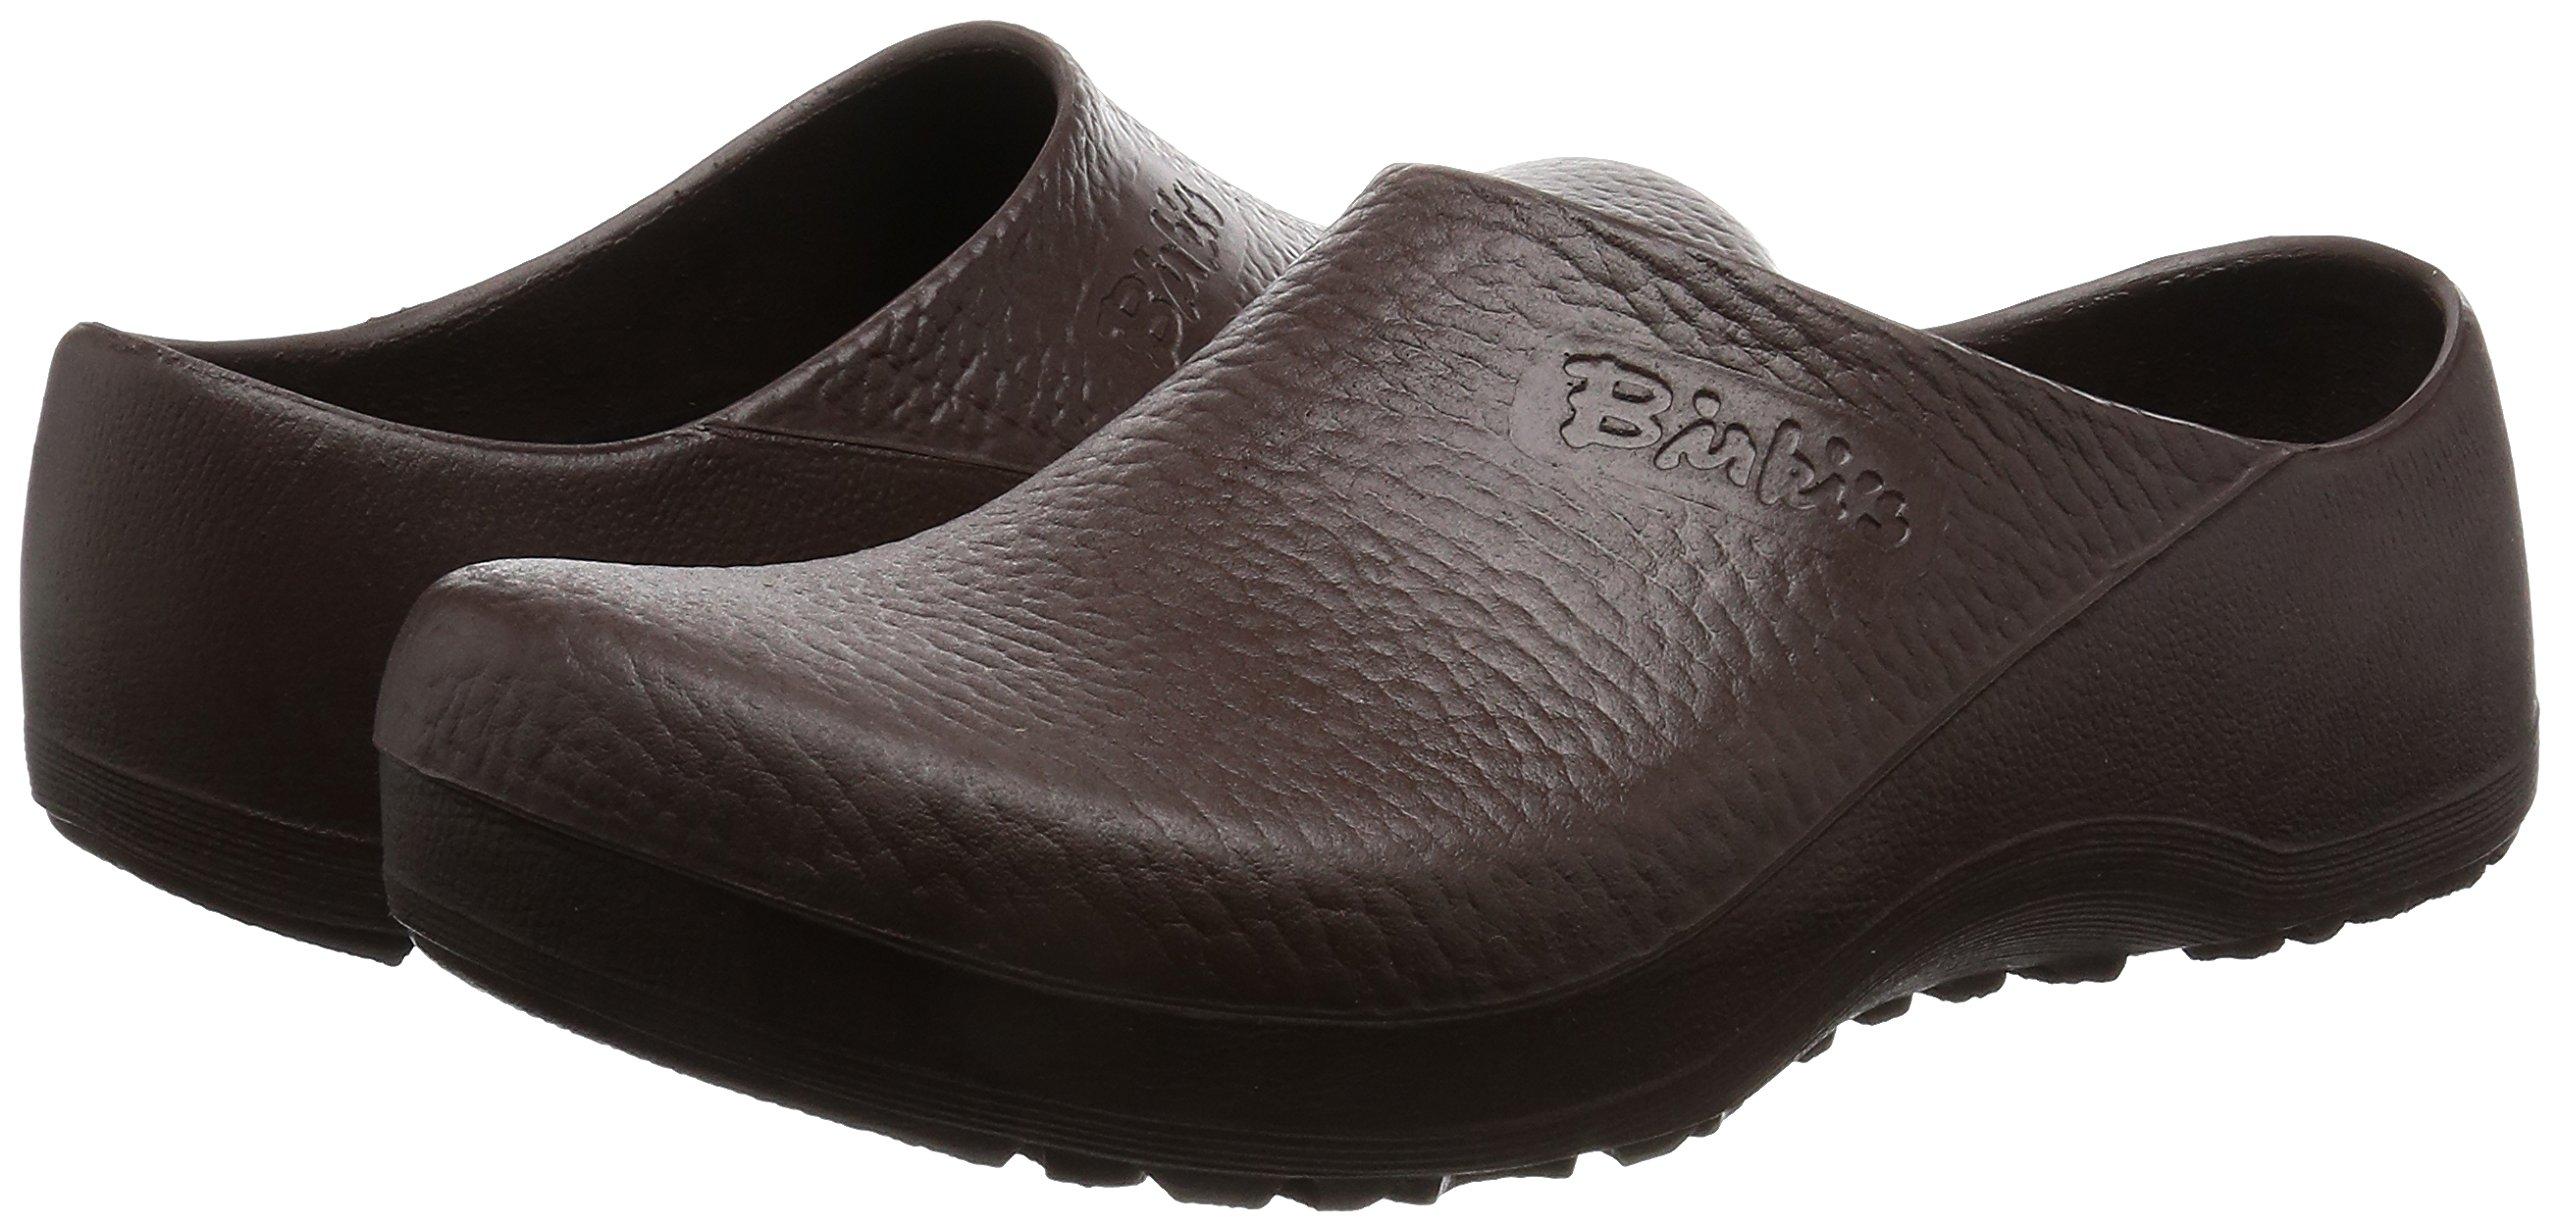 Birkenstock Men´s Profi-Birki Brown Alpro-Foam Sandals 40 EU (M7/L9 US) R 074061 by Birkenstock (Image #6)